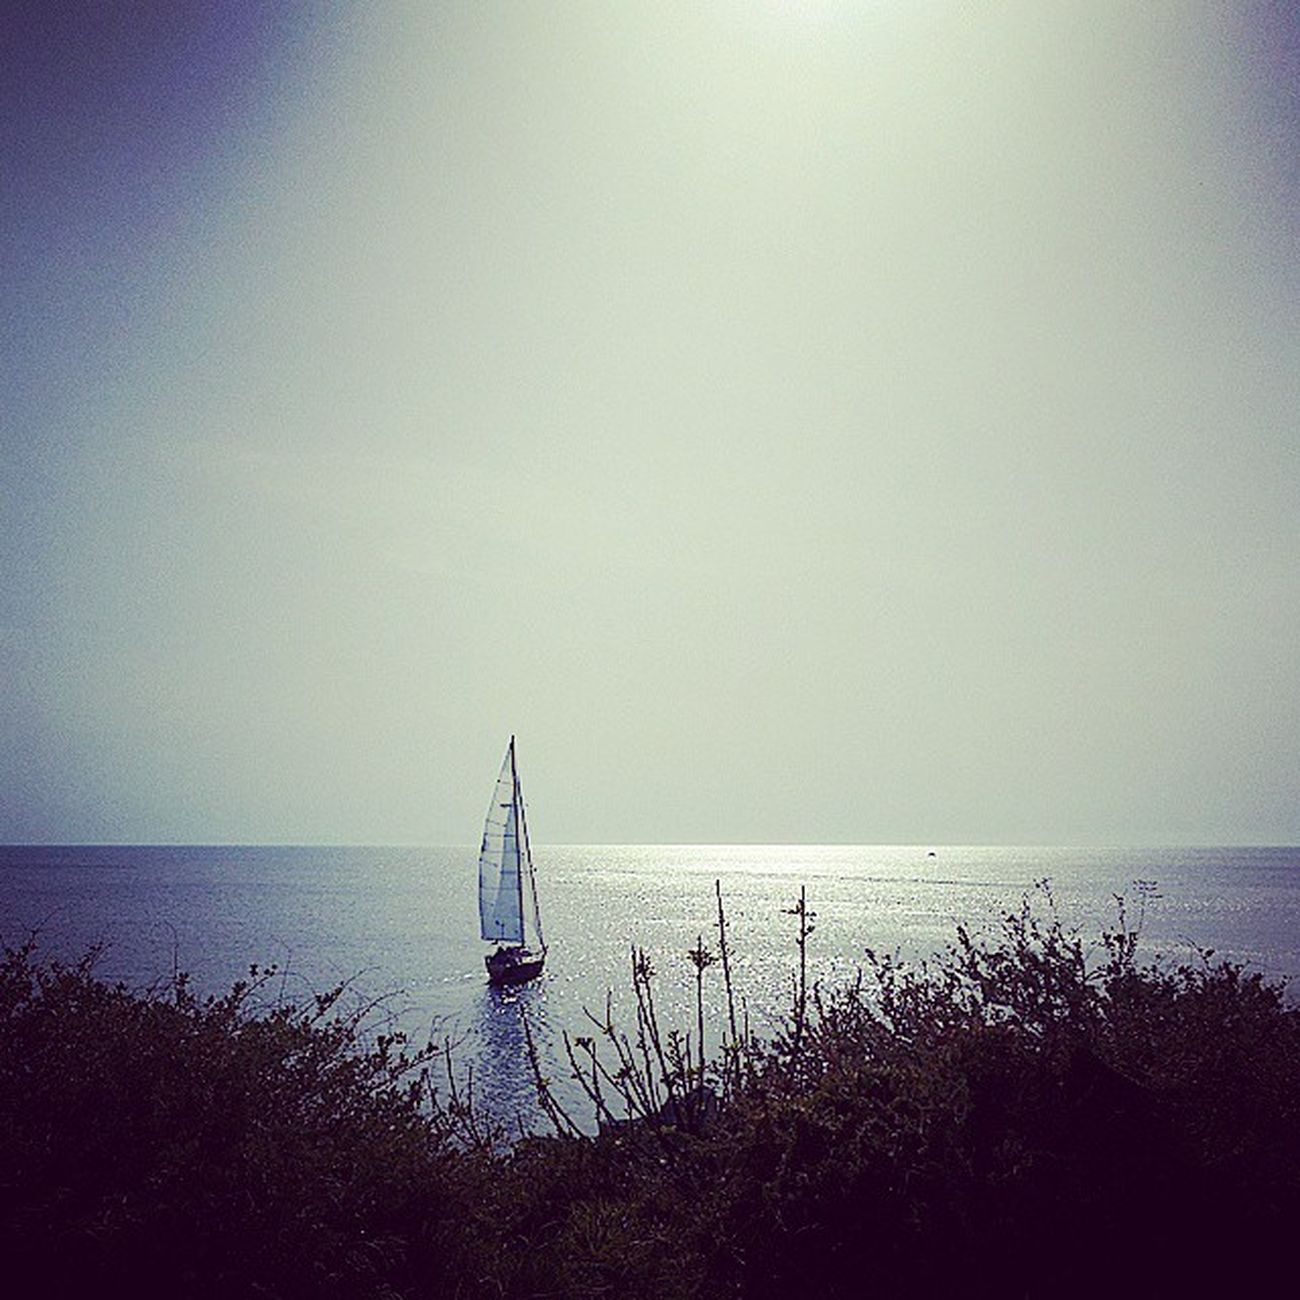 I tot s'acaba. Tornam a la rutina. Menorca Menorcamola Vacances Mar Mediterranean  Movilgrafosdelaño2015